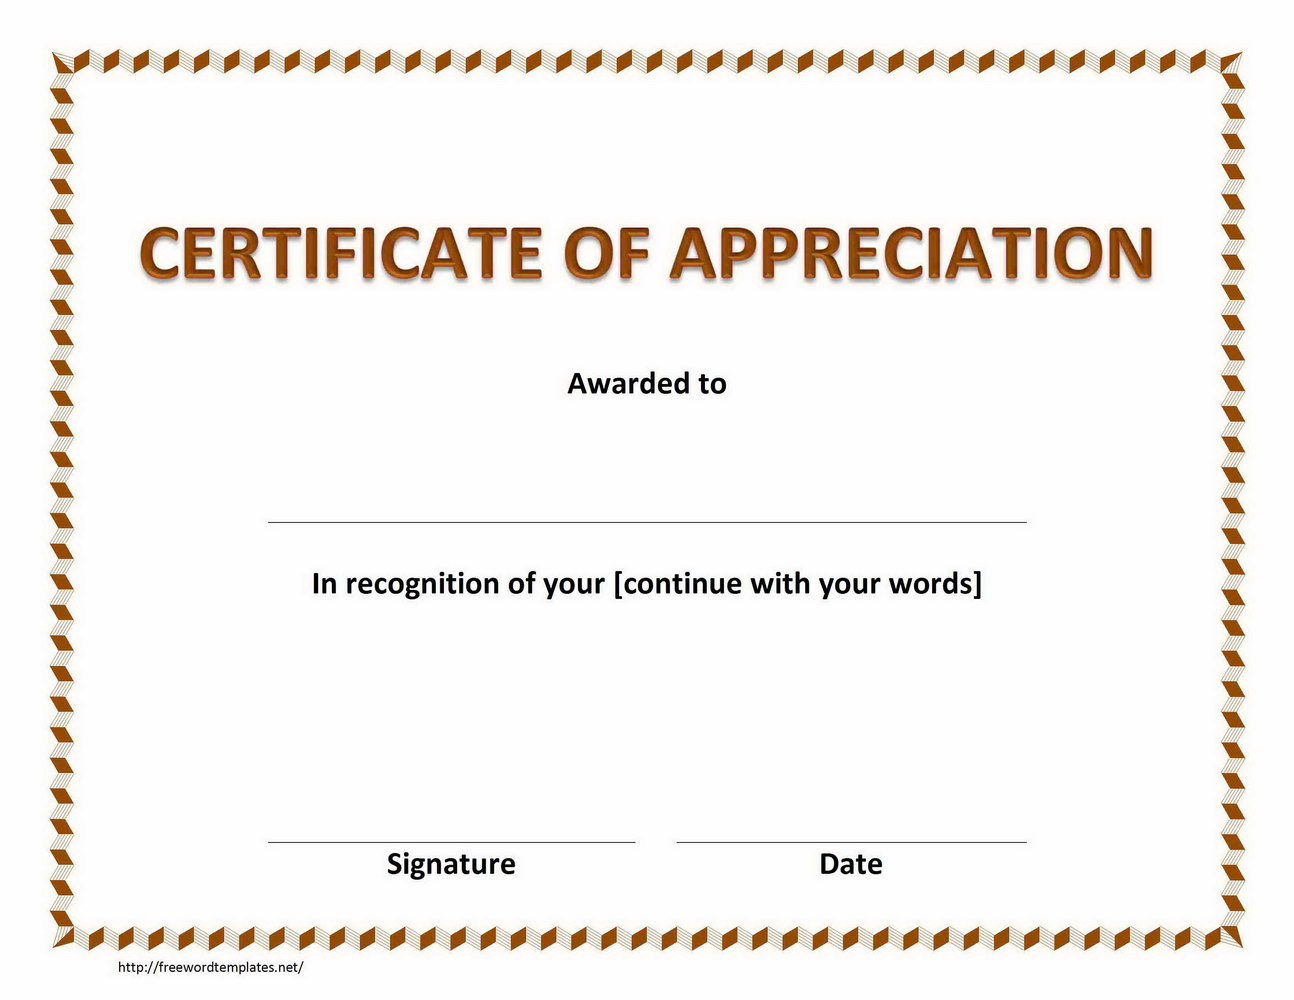 Blank Certificates Of Appreciation Templates Printable